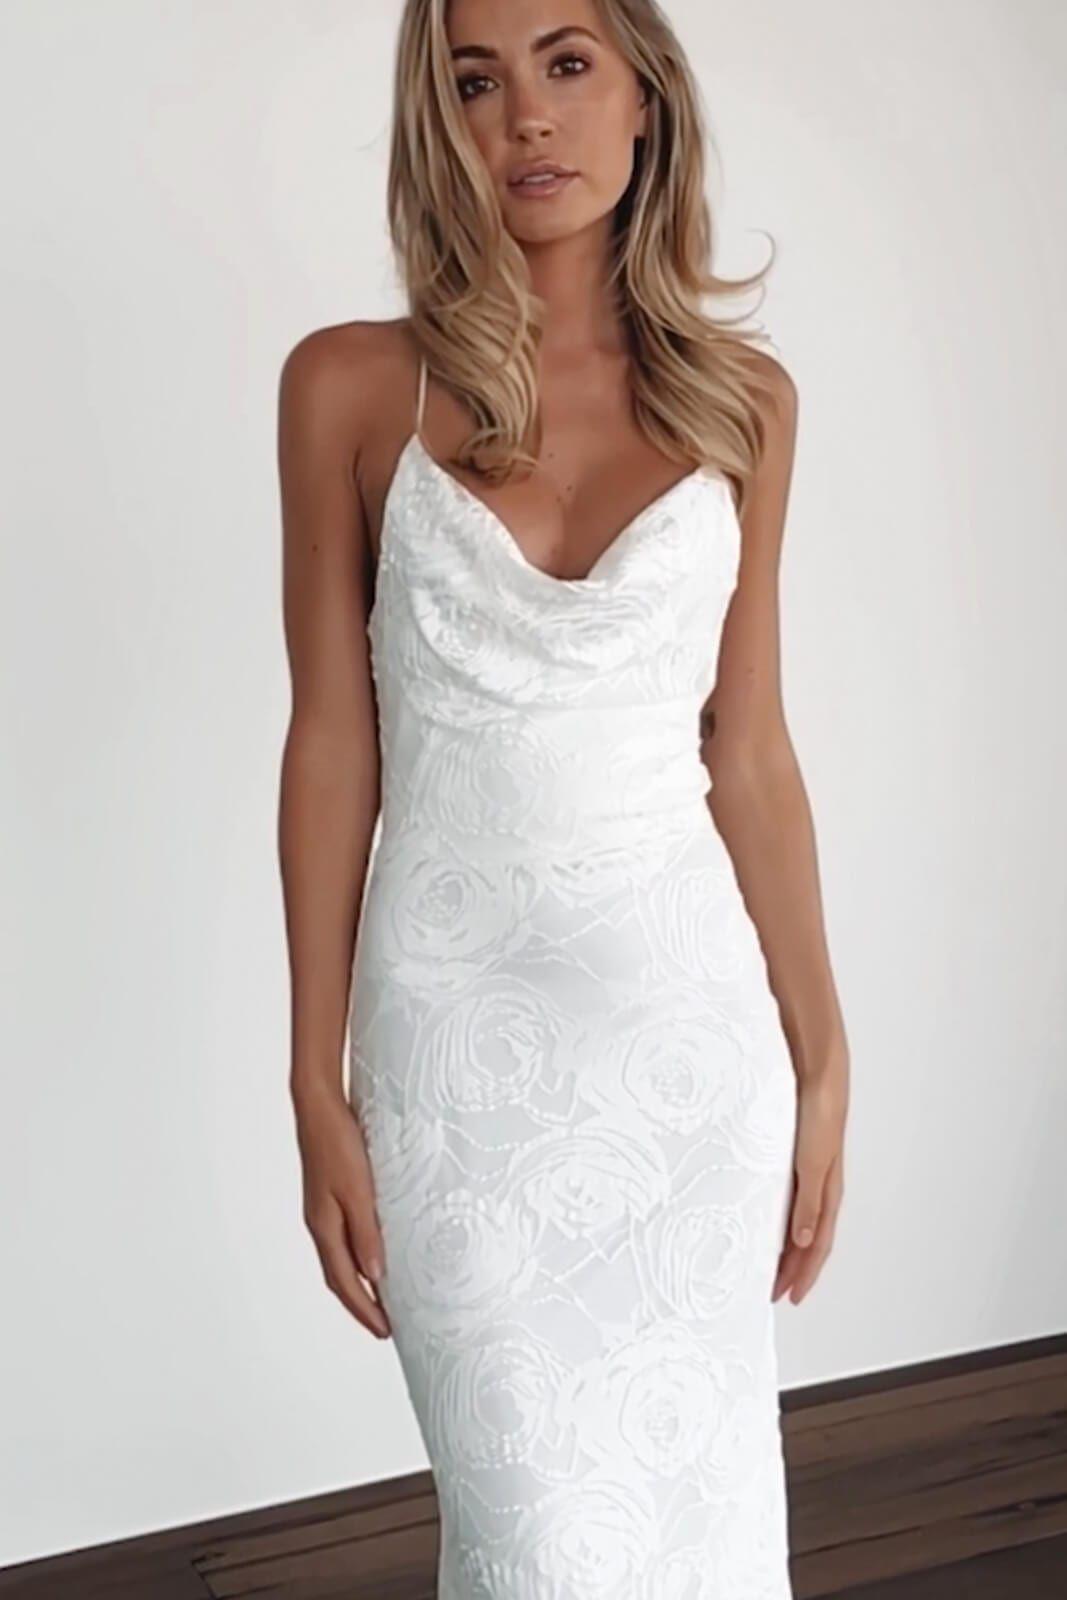 Honey rose gown lace wedding dress wedding dresses